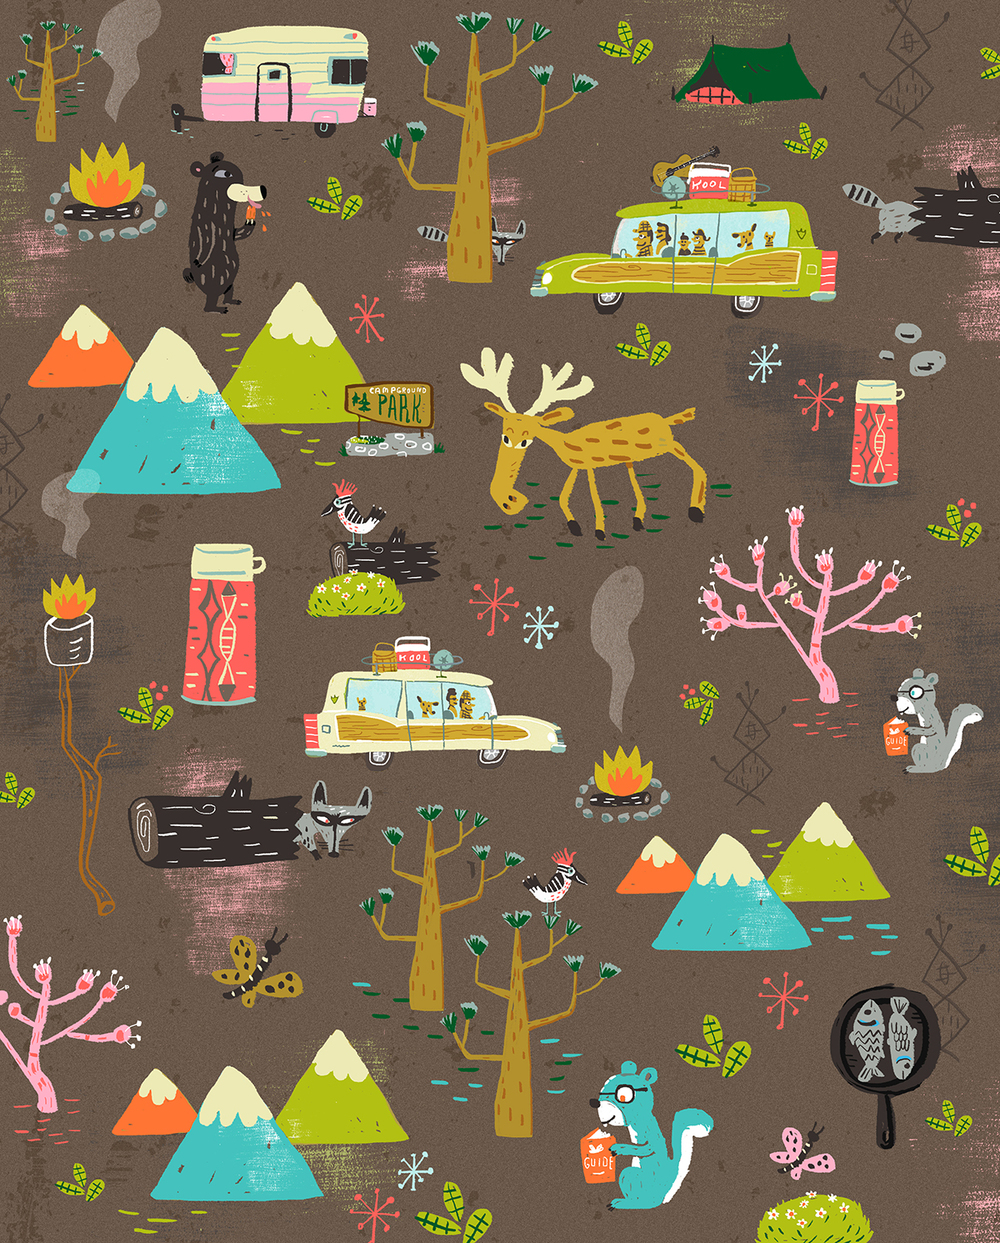 Campingfabric.alt.1200.jpg